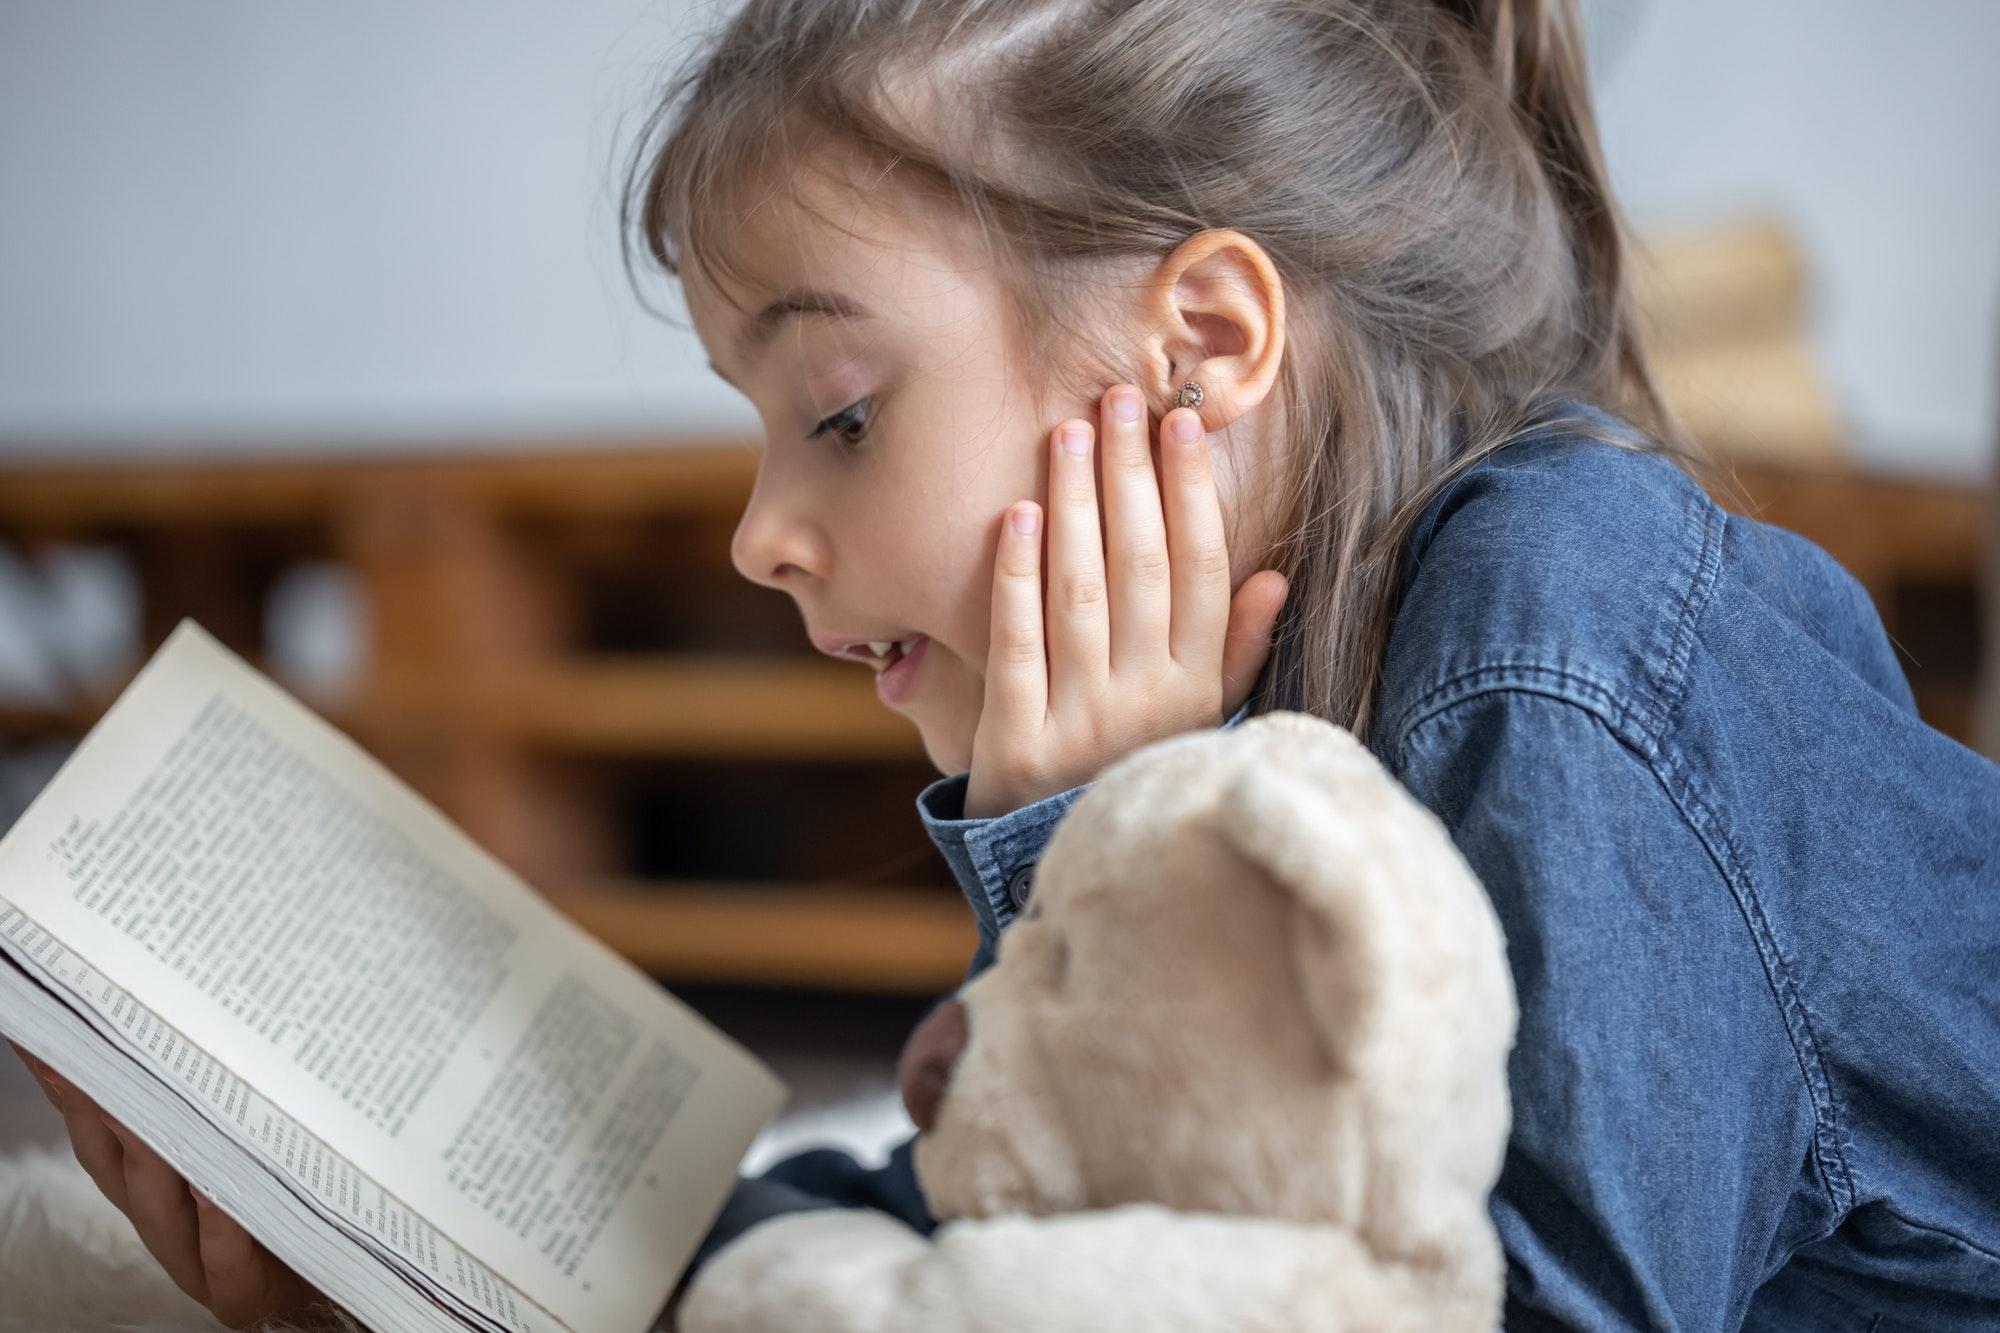 Little girl reads a book with a teddy bear.